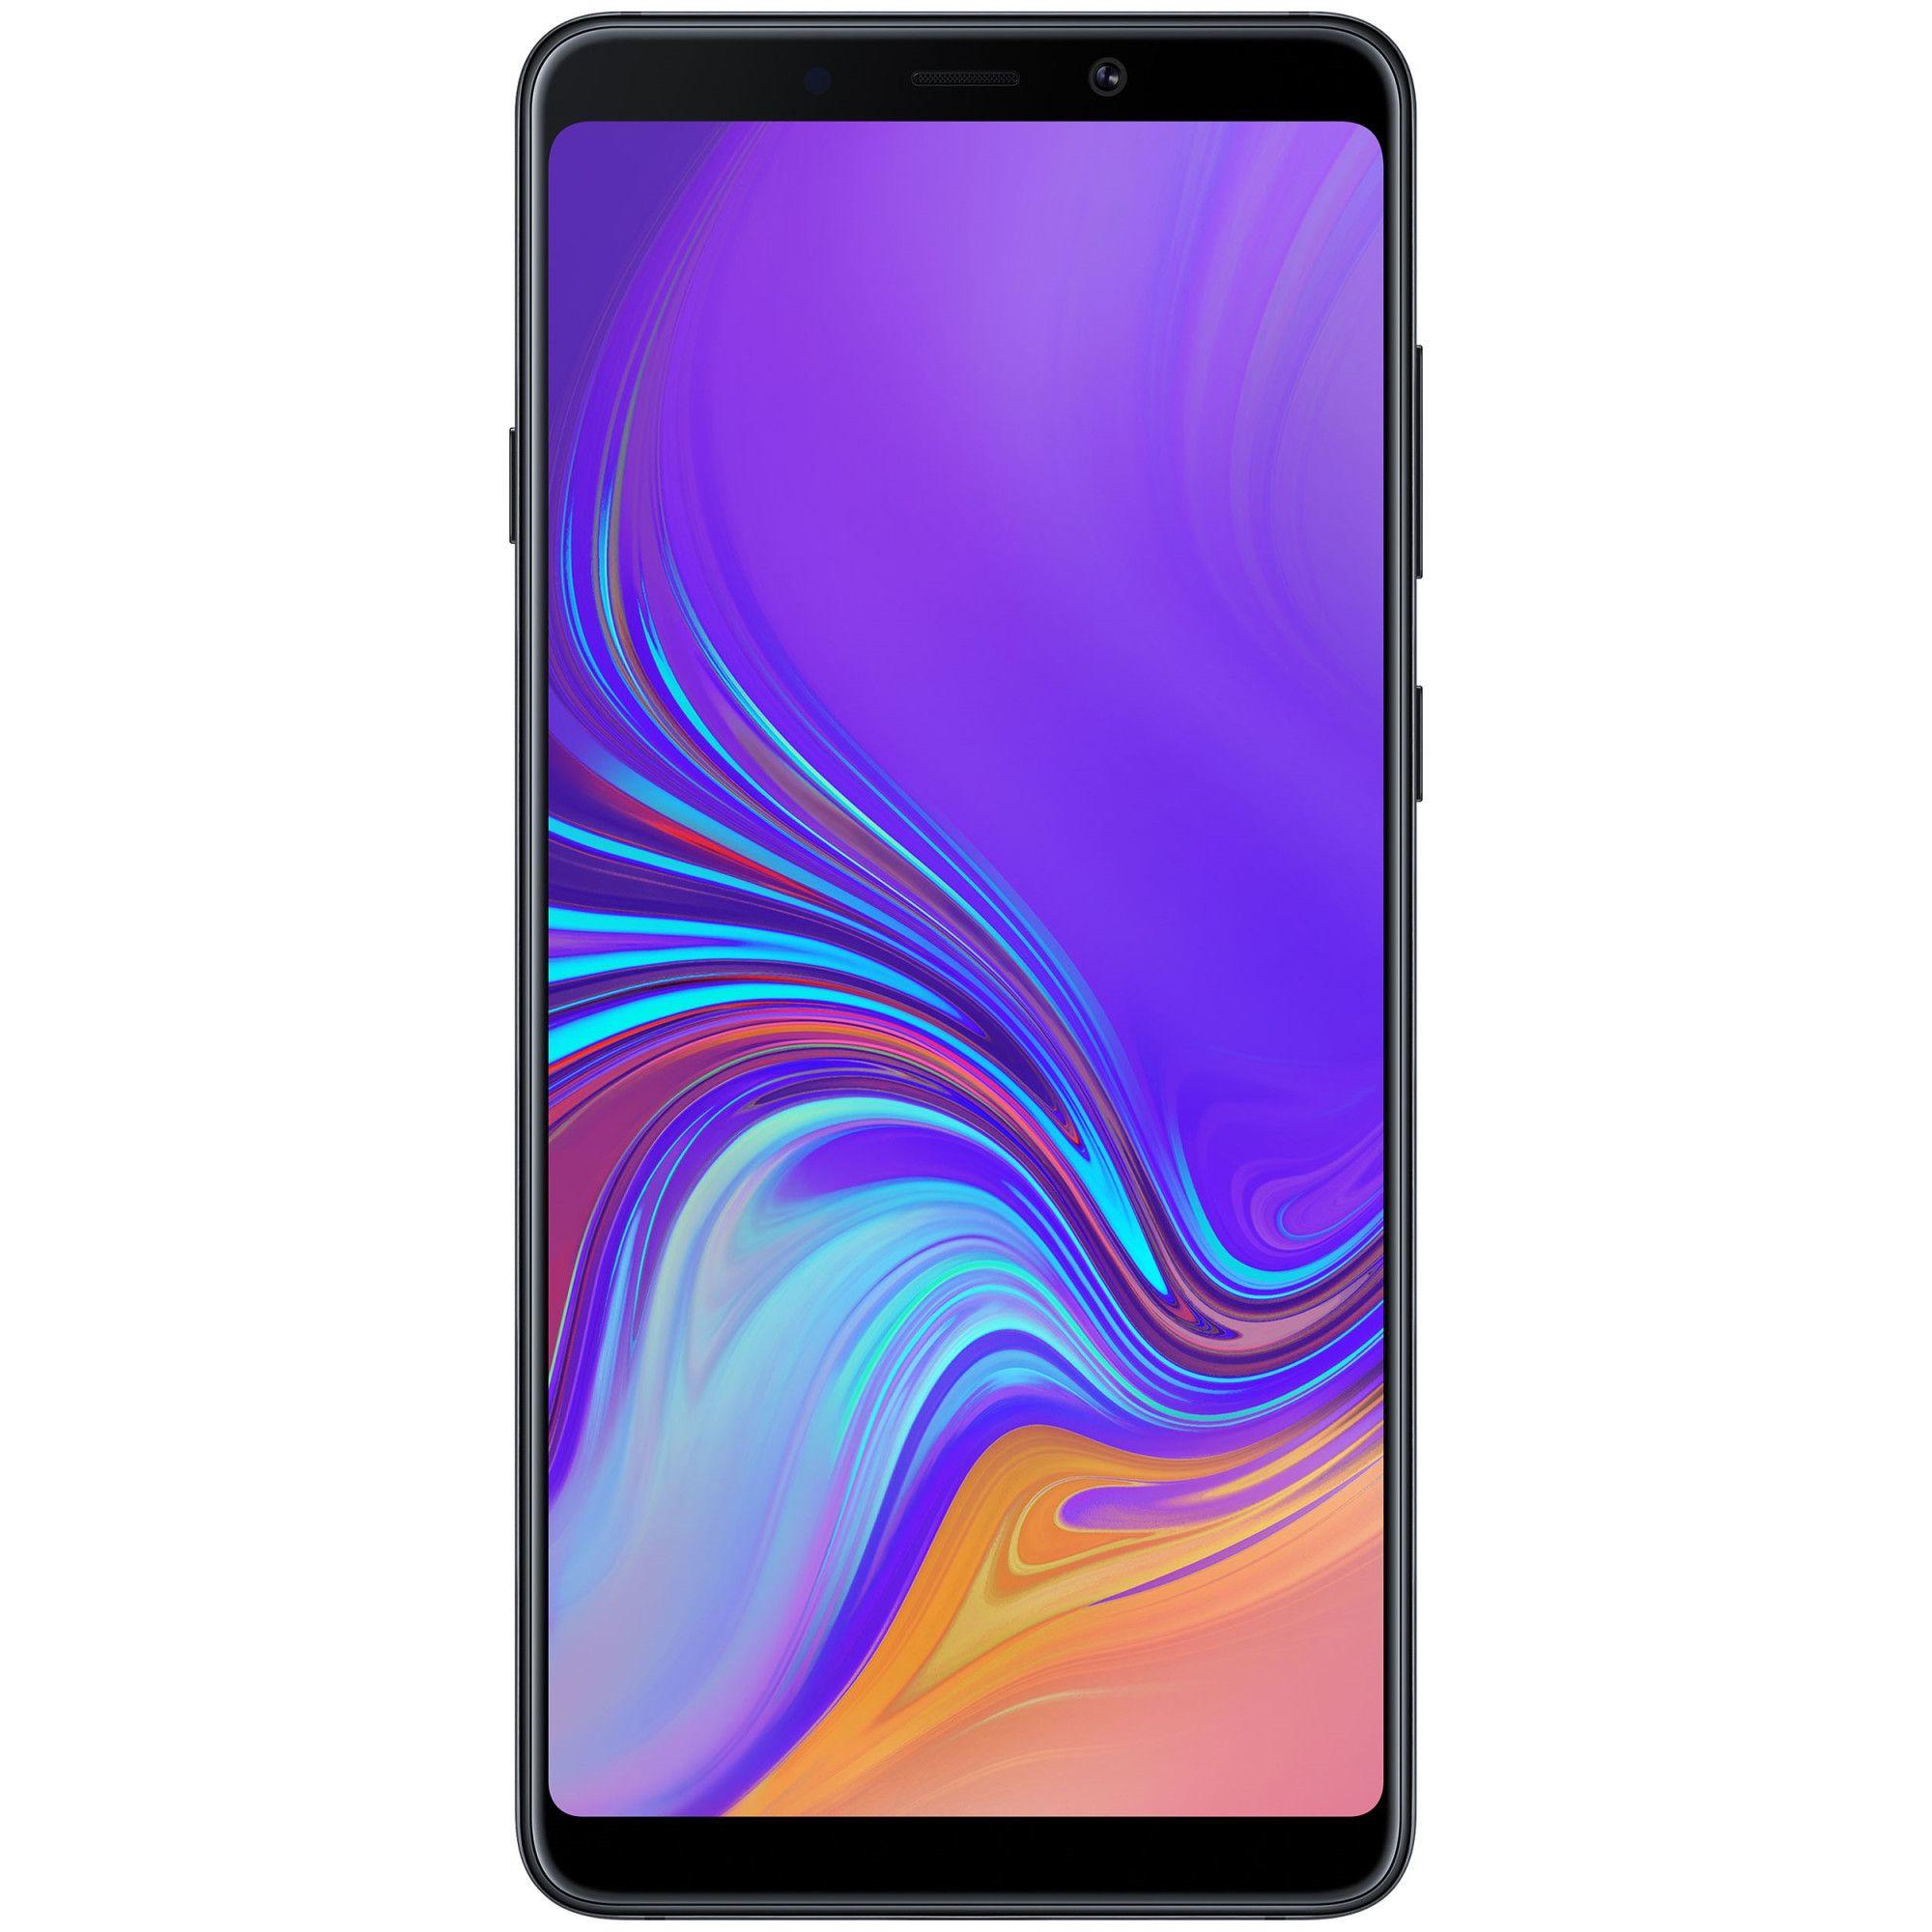 Telefon mobil Samsung Galaxy A9 (2018), Dual SIM, 128GB, 6GB RAM, Caviar Black